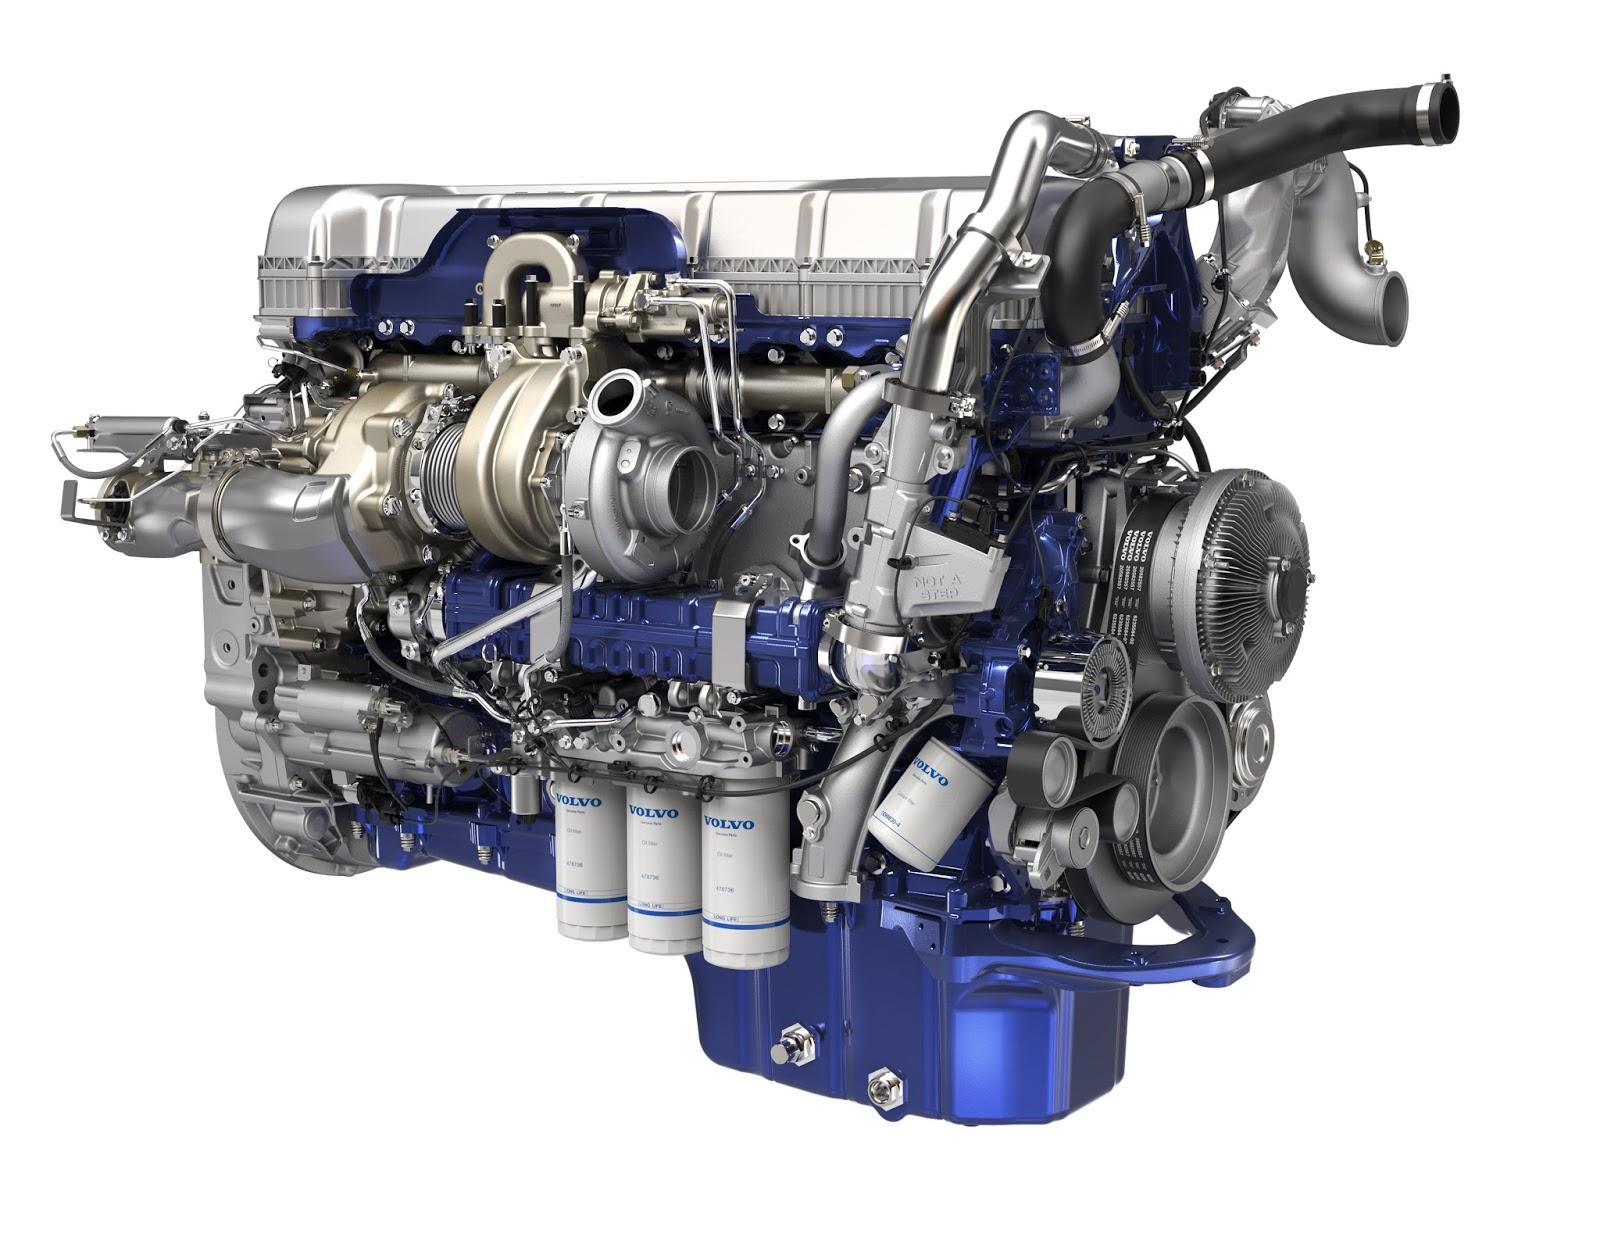 dieciocho ruedas: nuevos motores volvo d 13/d16/d11 …euro ... v8 engine oil diagram